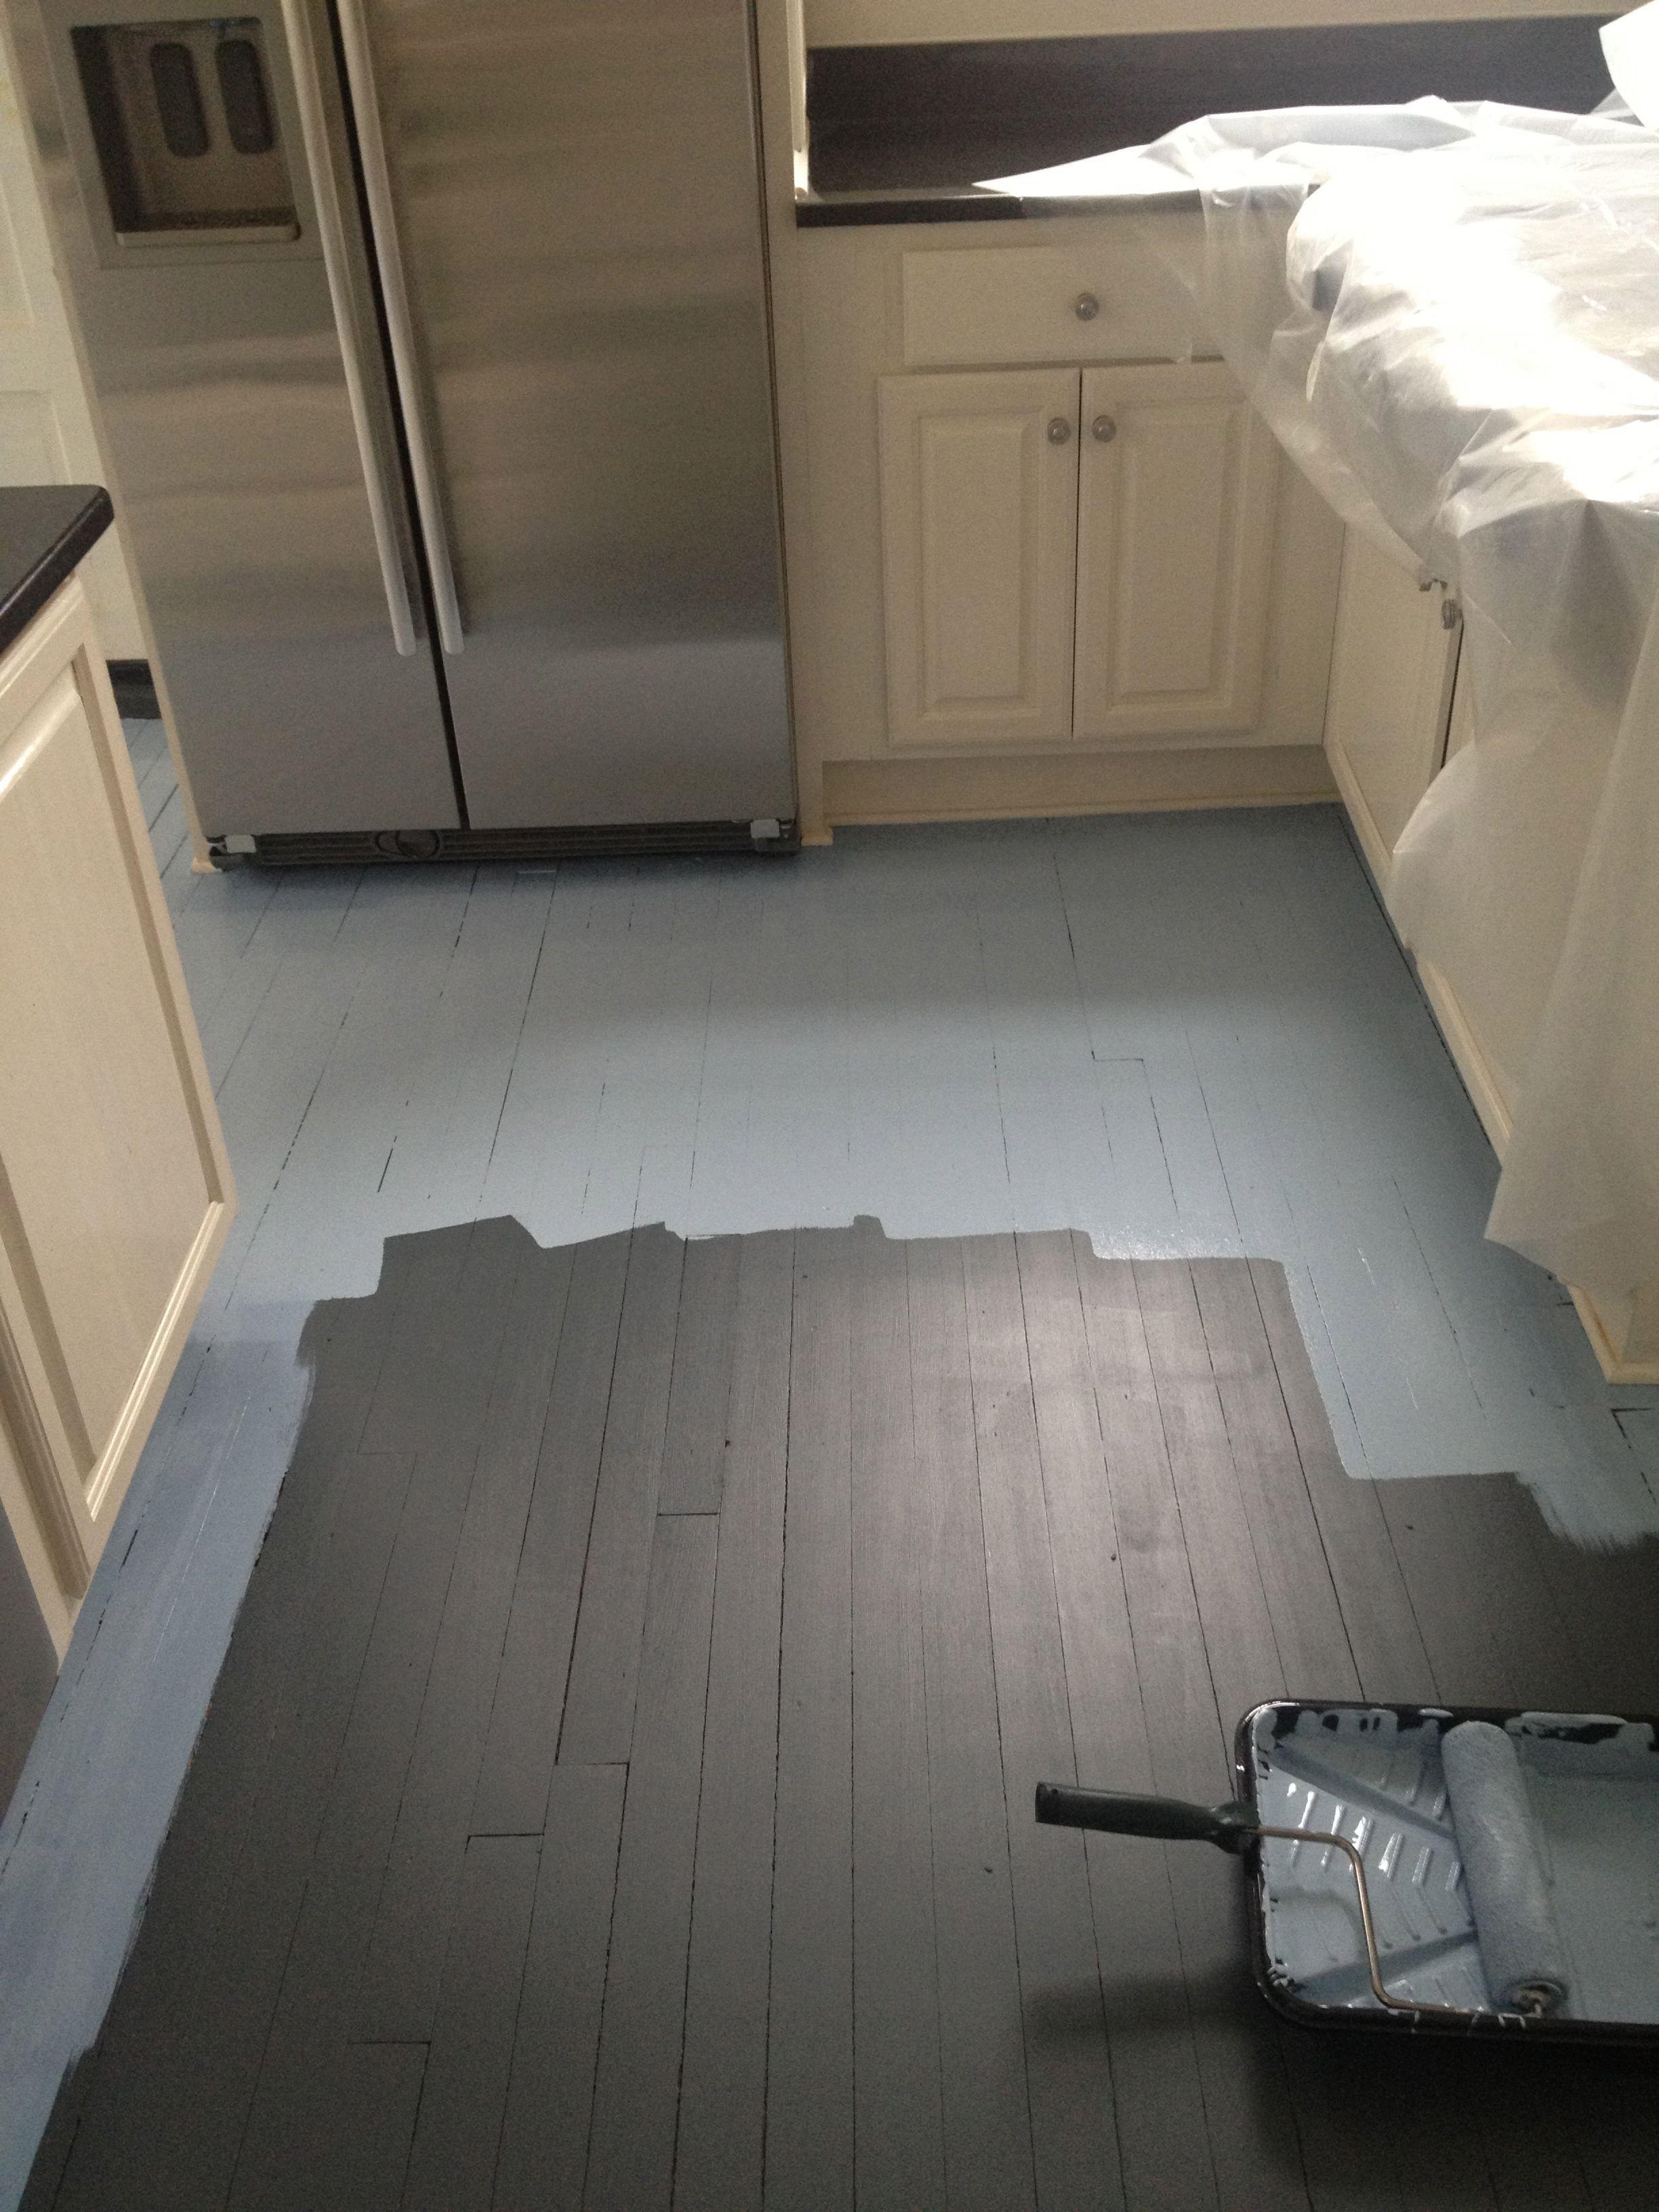 hardwood floor in kitchen DIY How to Paint Wood Floors White Revisited DIY furniture Pinterest Hardwood floors My love and Paint wood floors